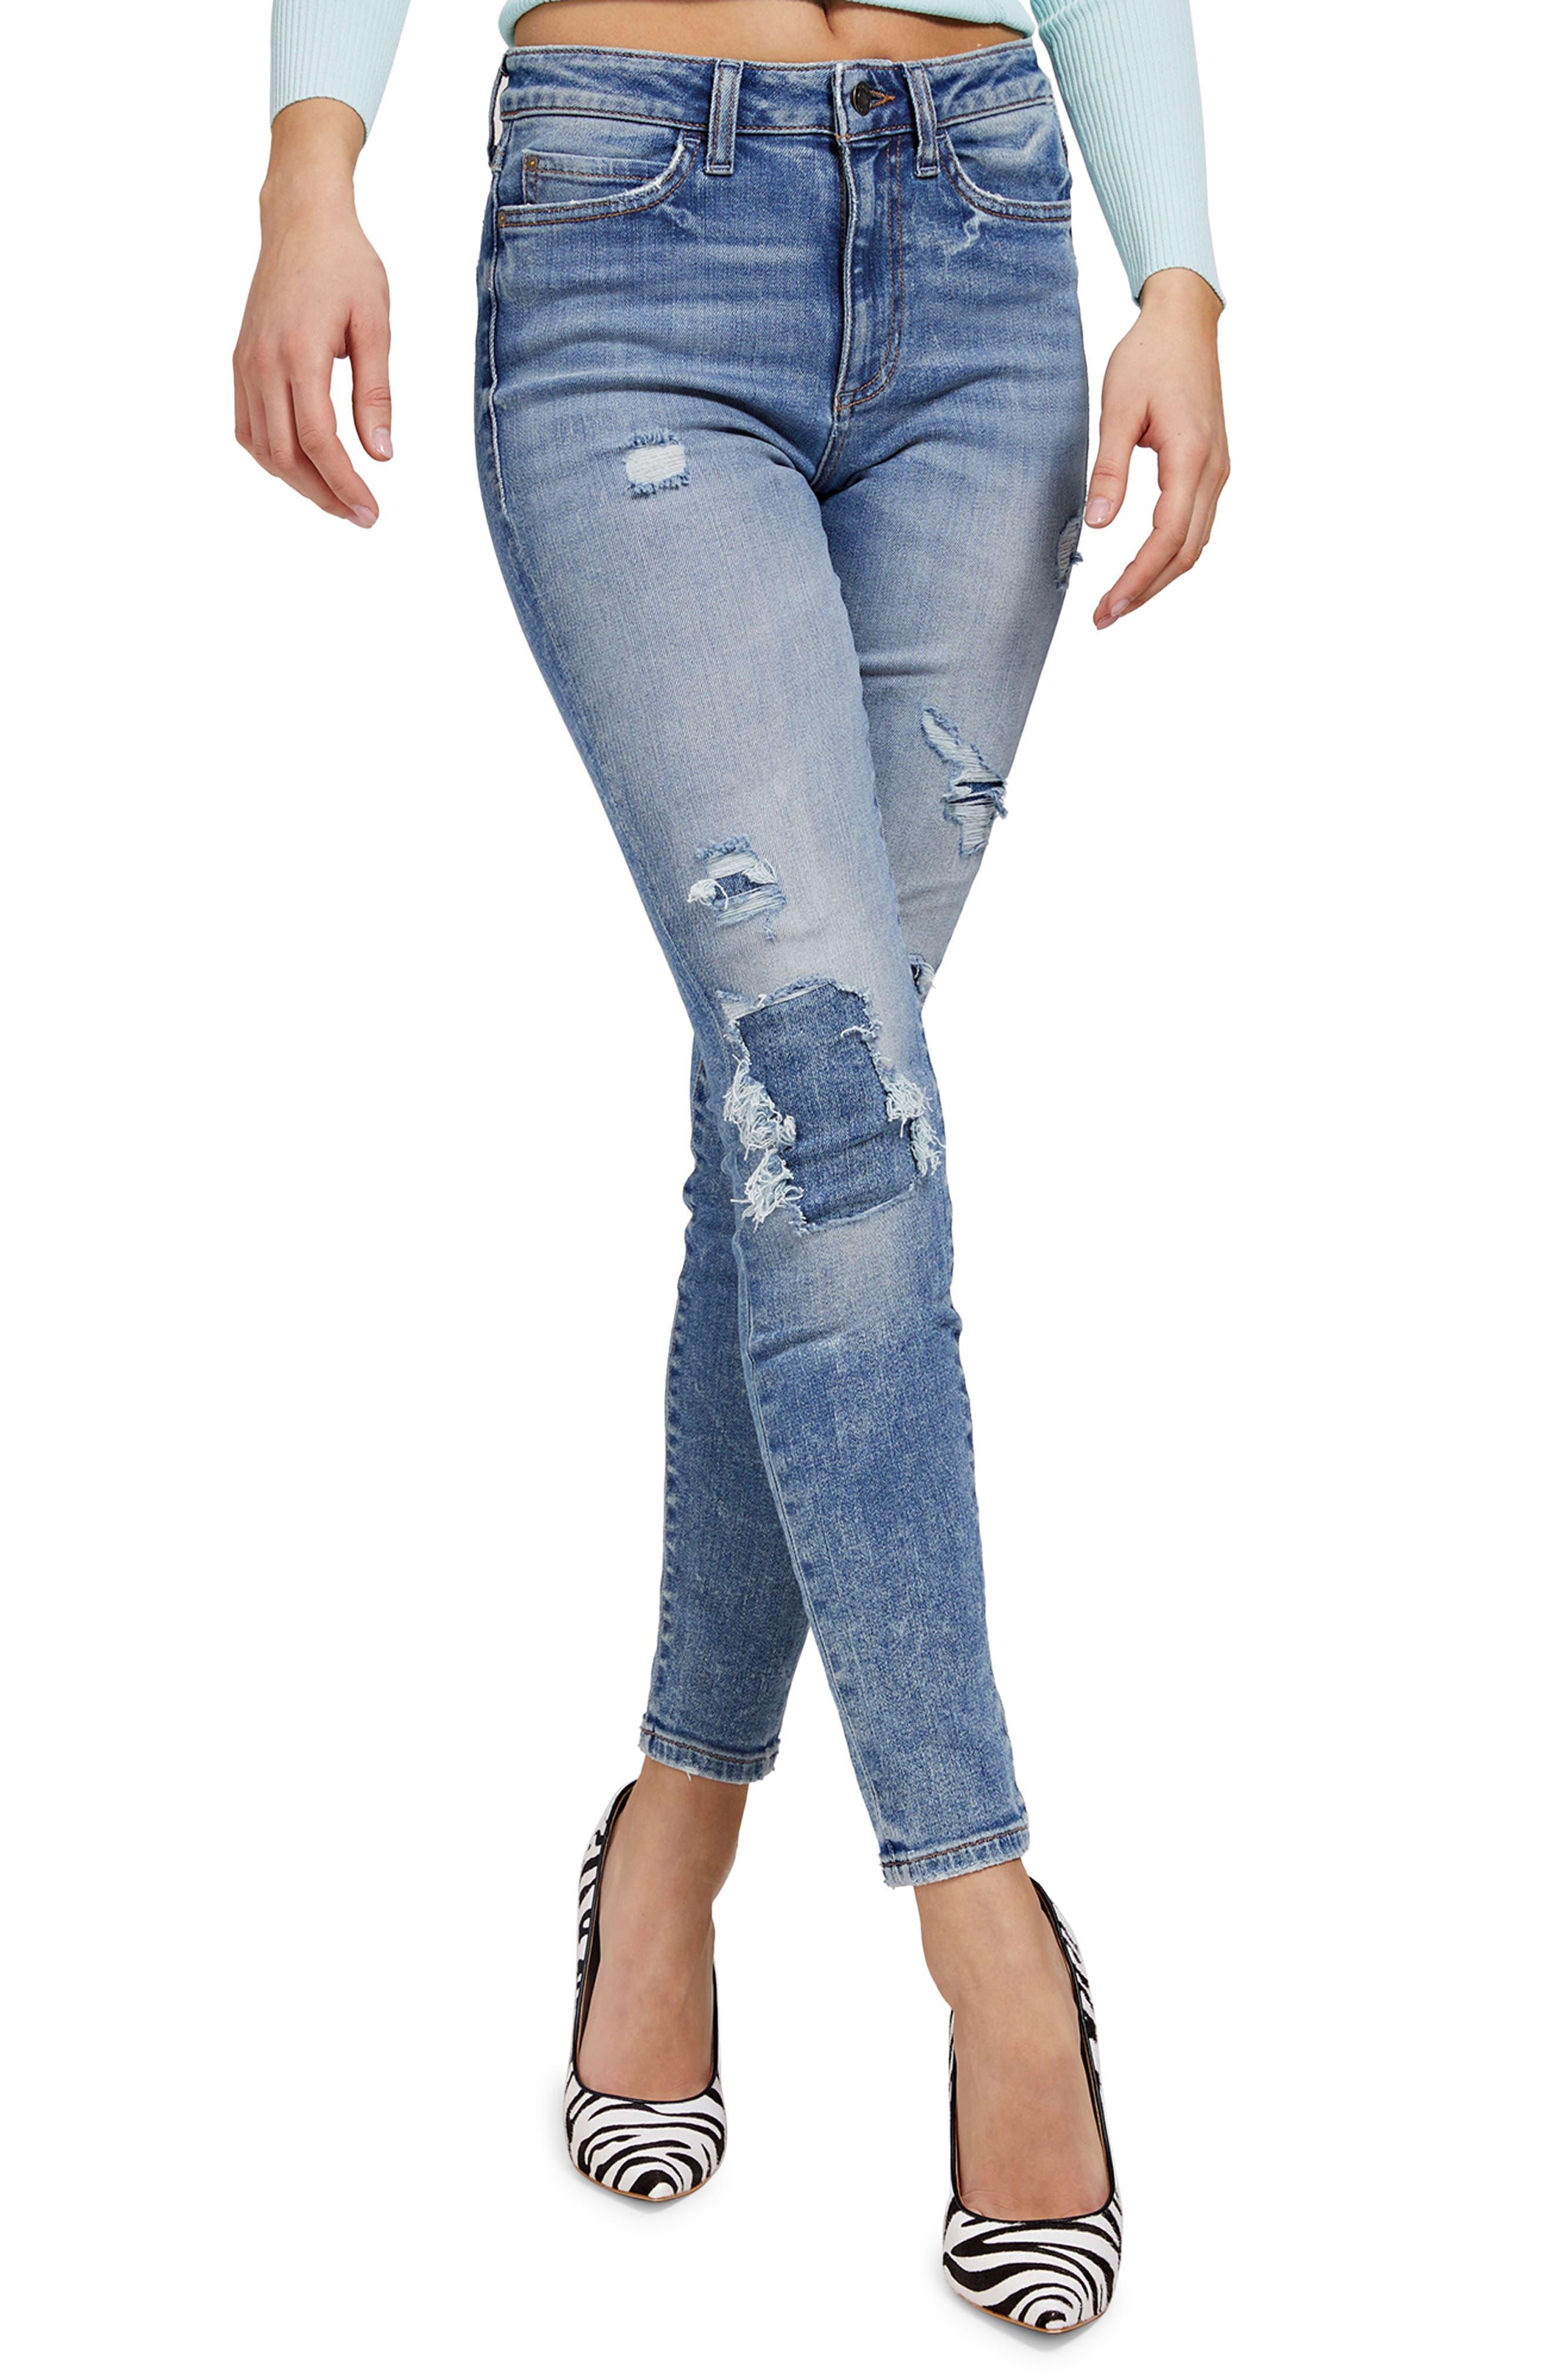 1981 Eco High Waist Distressed Skinny Jeans